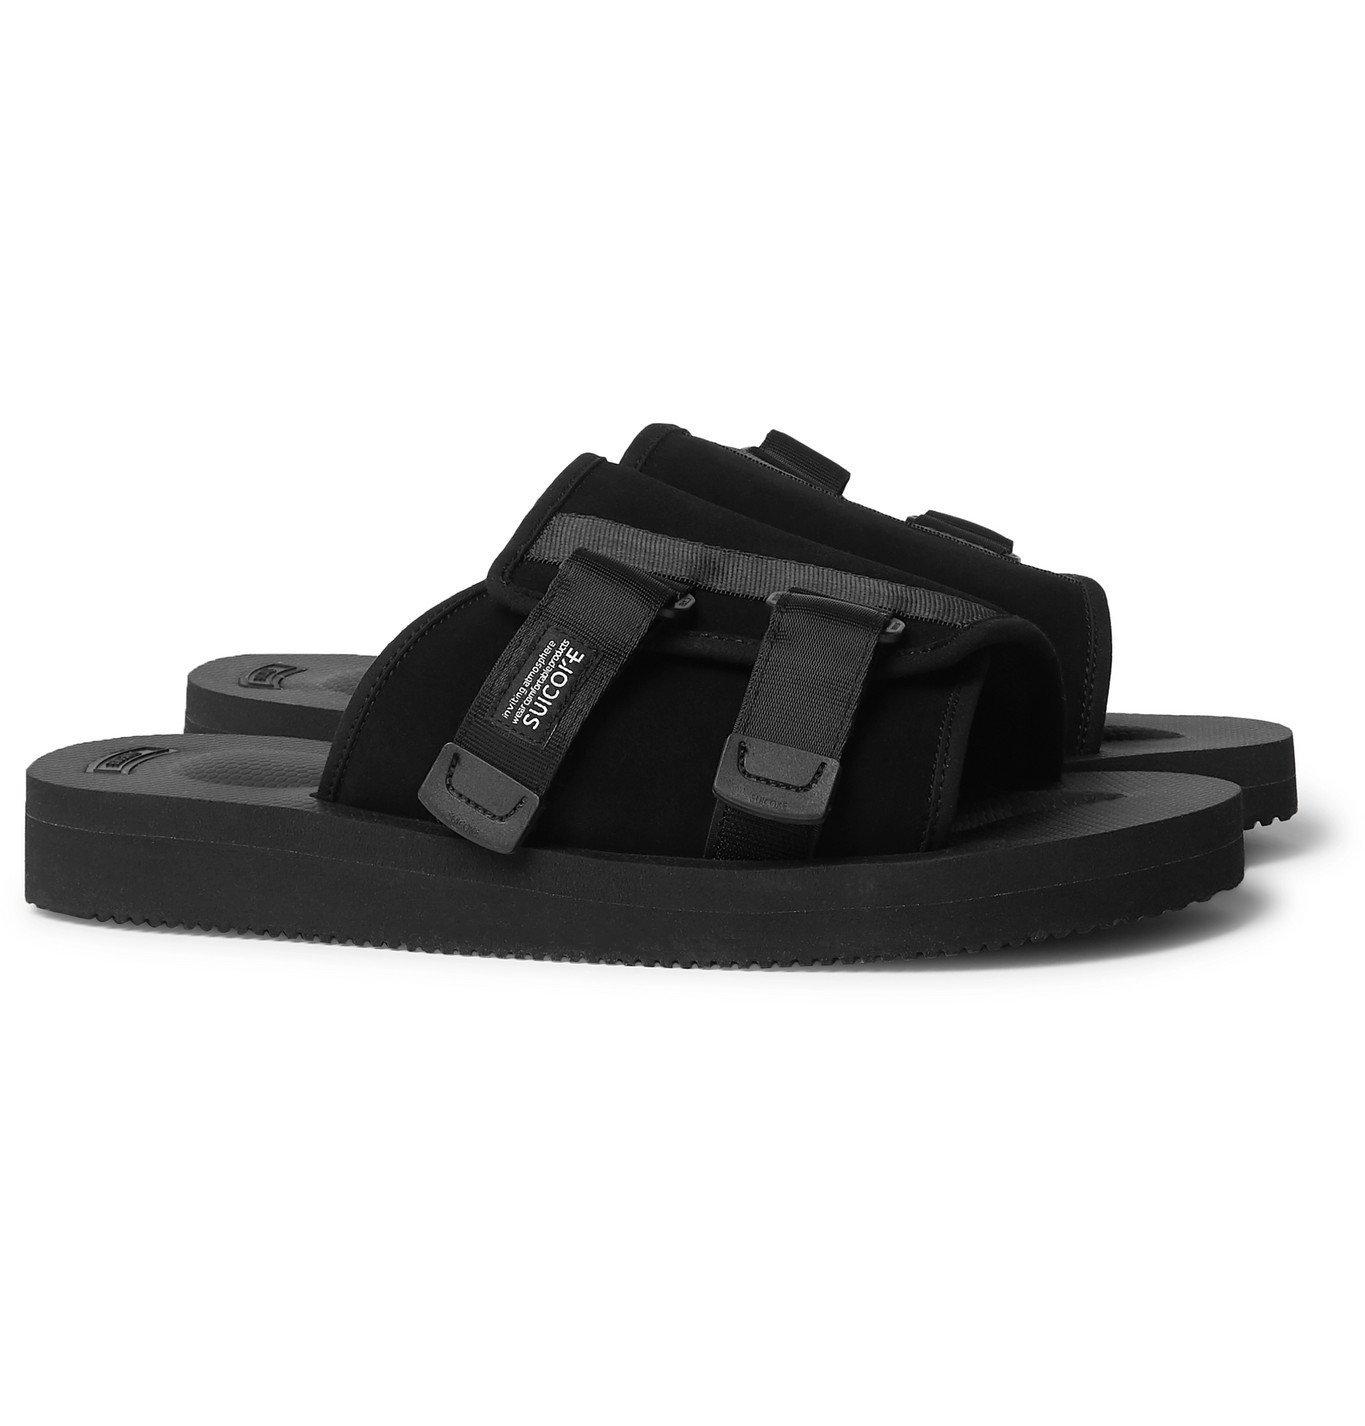 Photo: Suicoke - KAW-VS Webbing-Trimmed Suede Sandals - Black